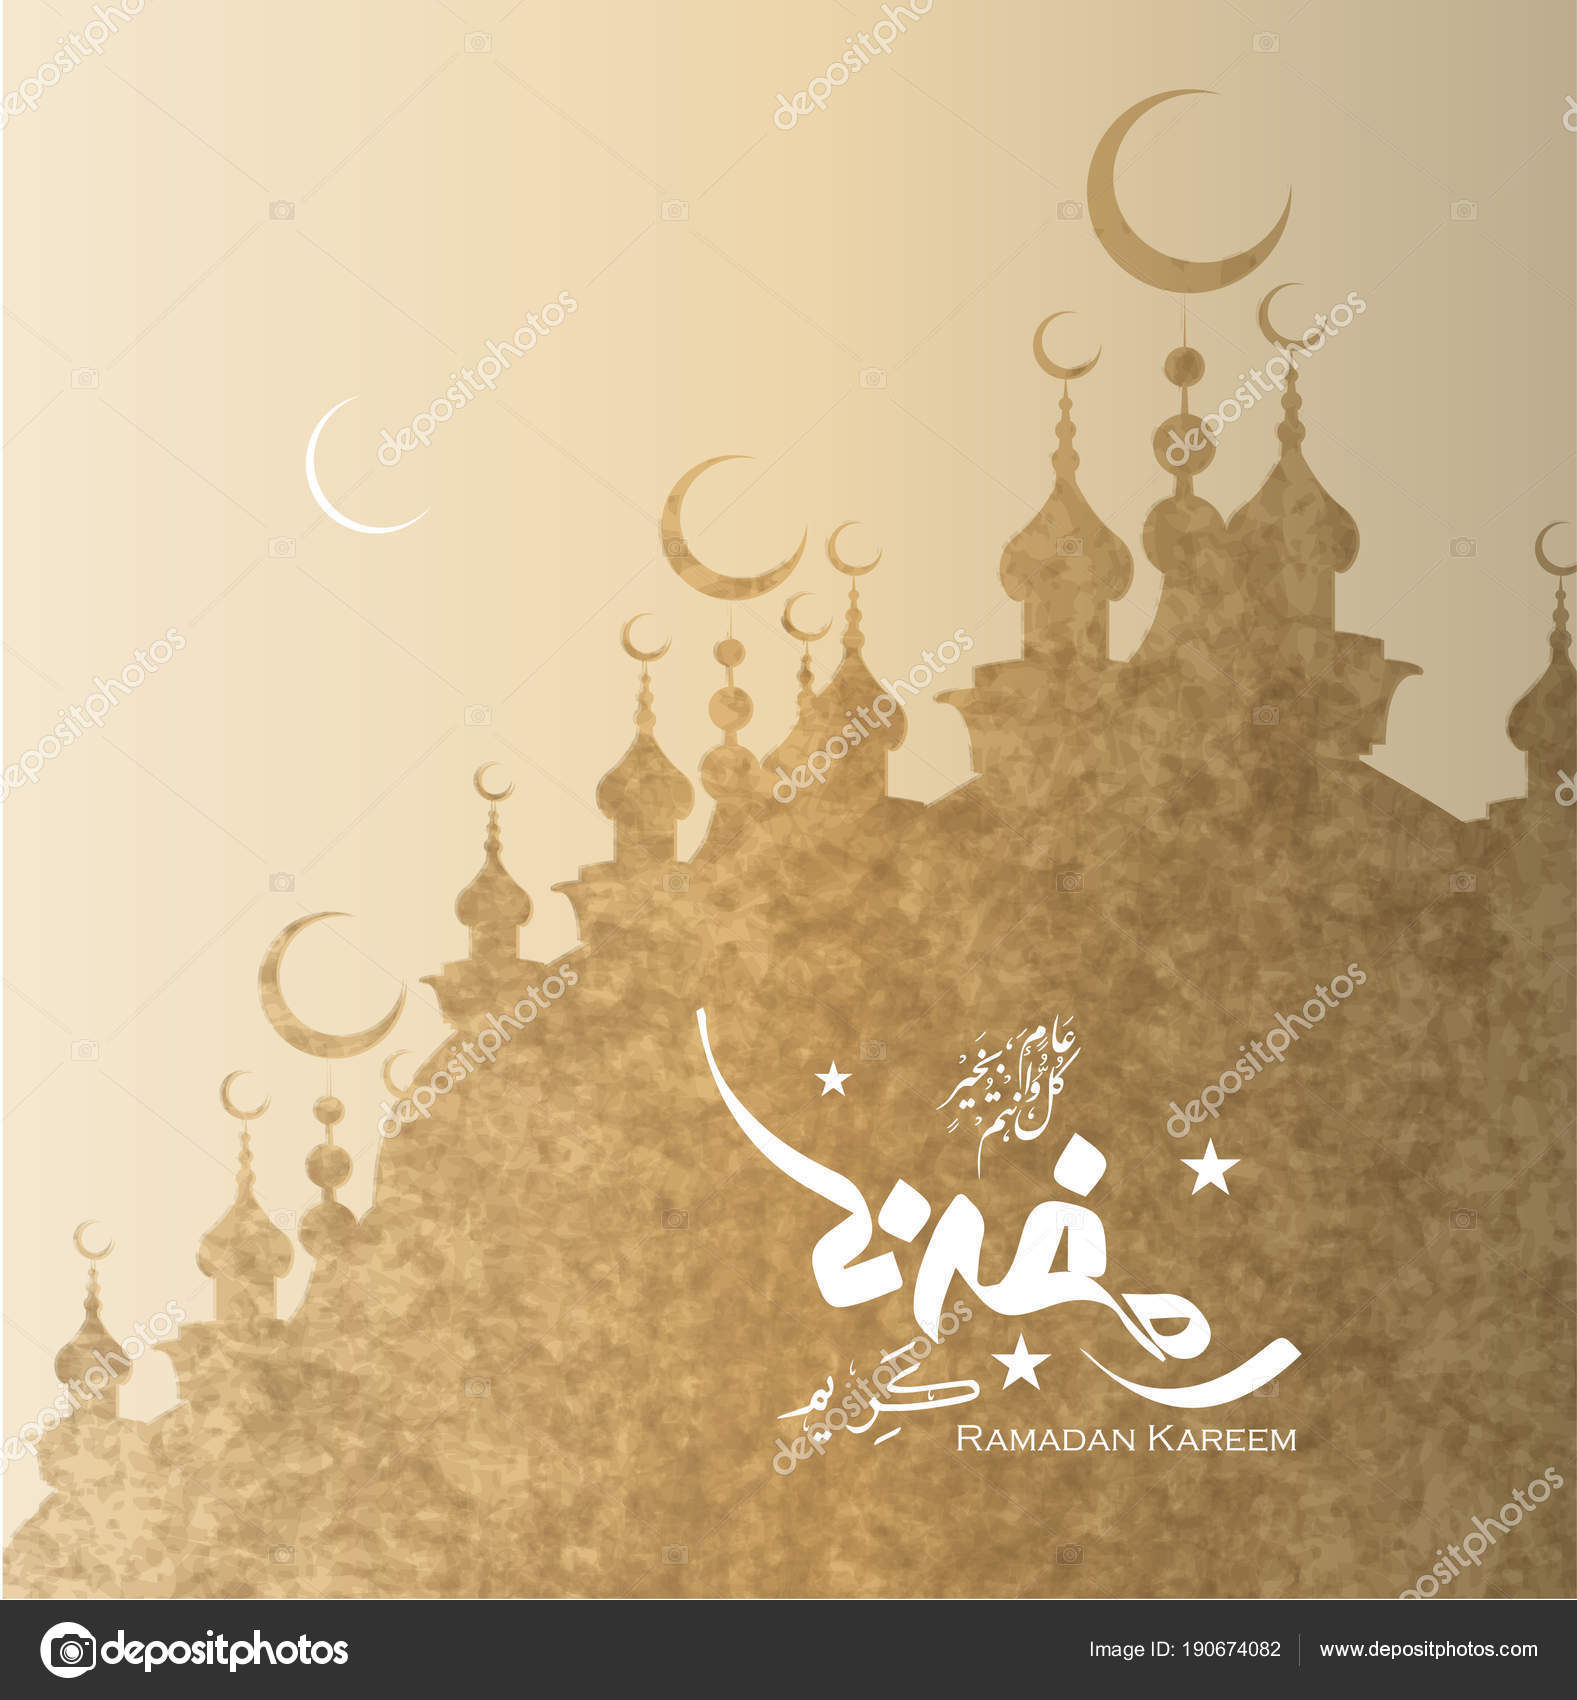 Ramadan kareem mubarak greeting cards arabic calligraphy translation ramadan kareem mubarak greeting cards arabic calligraphy translation generous ramadhan stock vector m4hsunfo